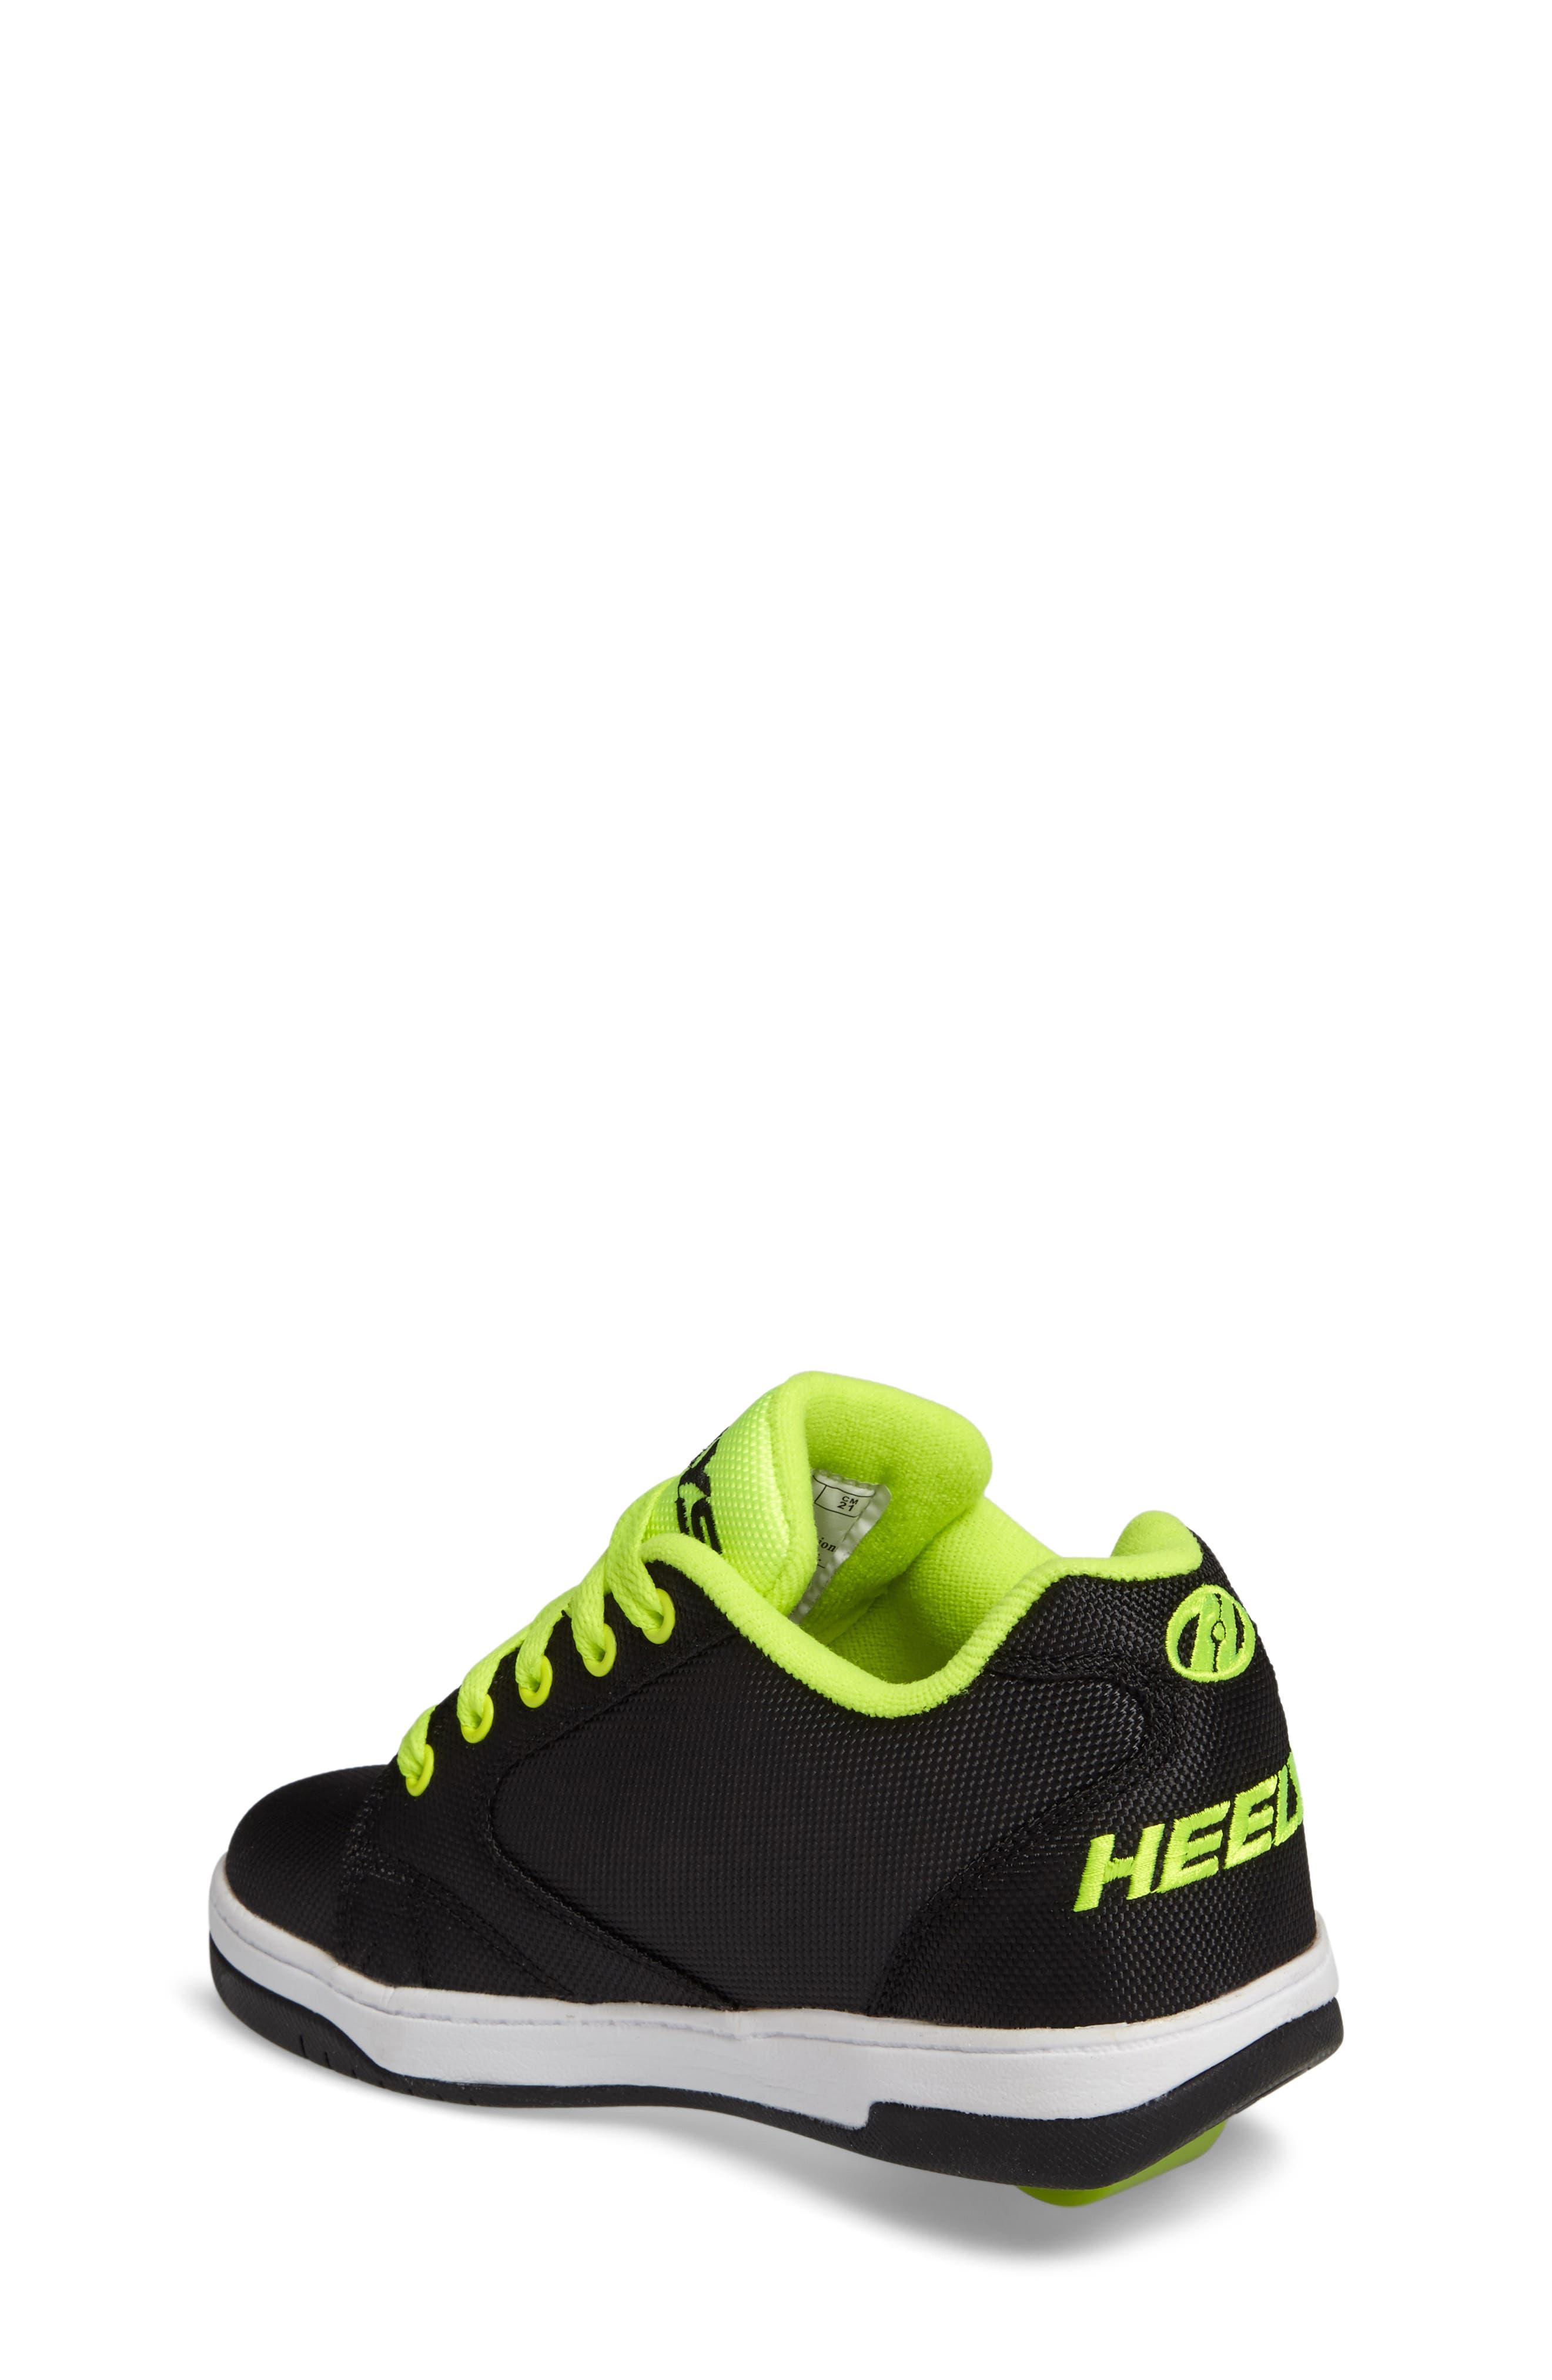 HEELYS,                             'Propel 2.0' Wheeled Sneaker,                             Alternate thumbnail 2, color,                             018